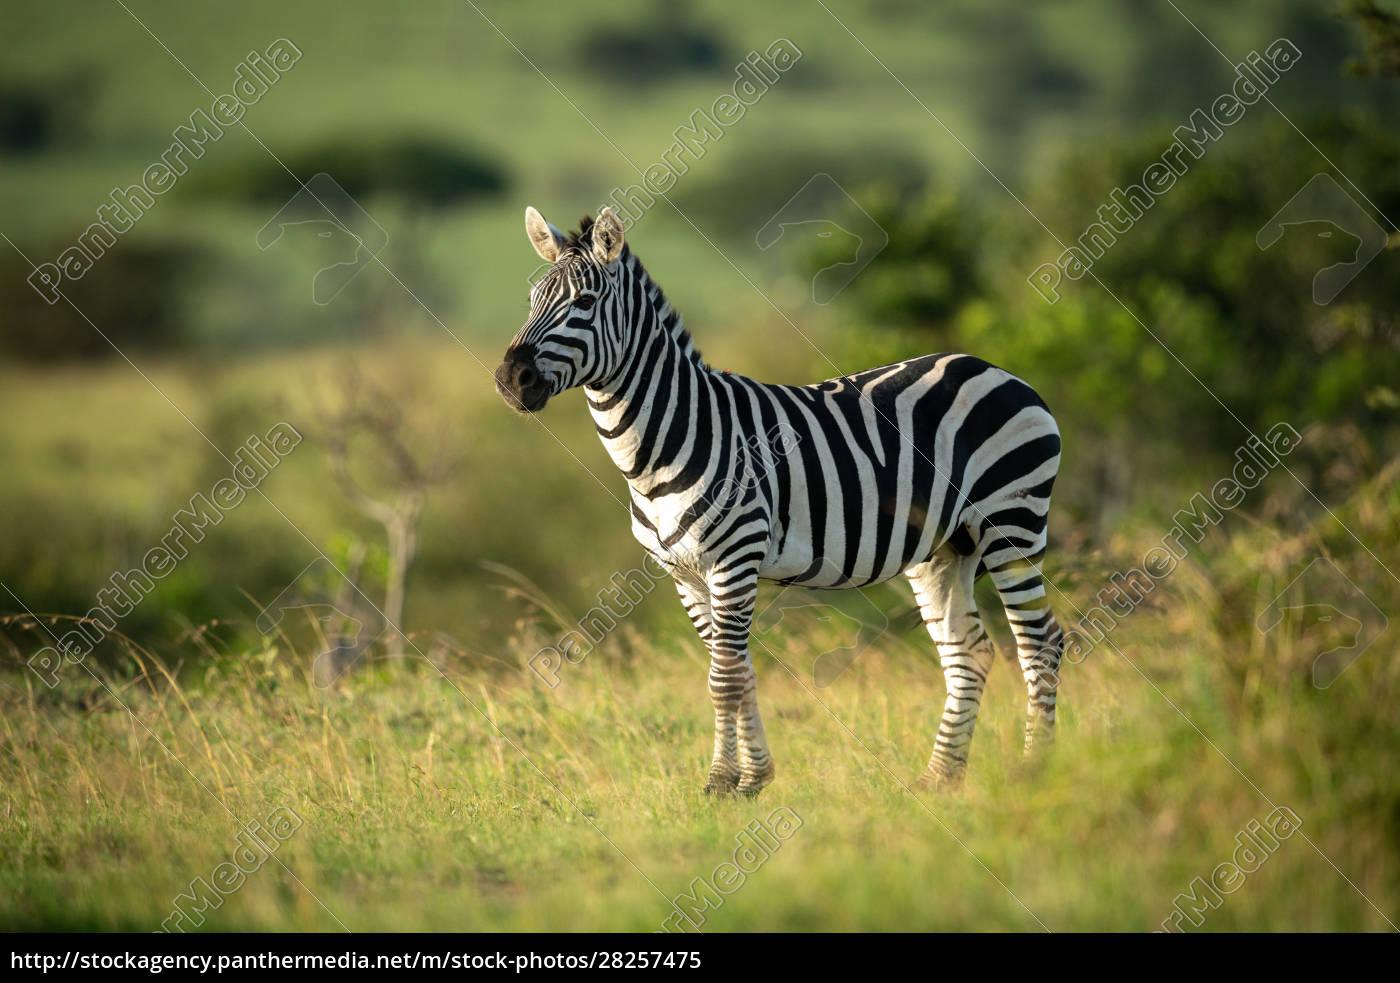 plains, zebra, stands, eyeing, camera, in - 28257475